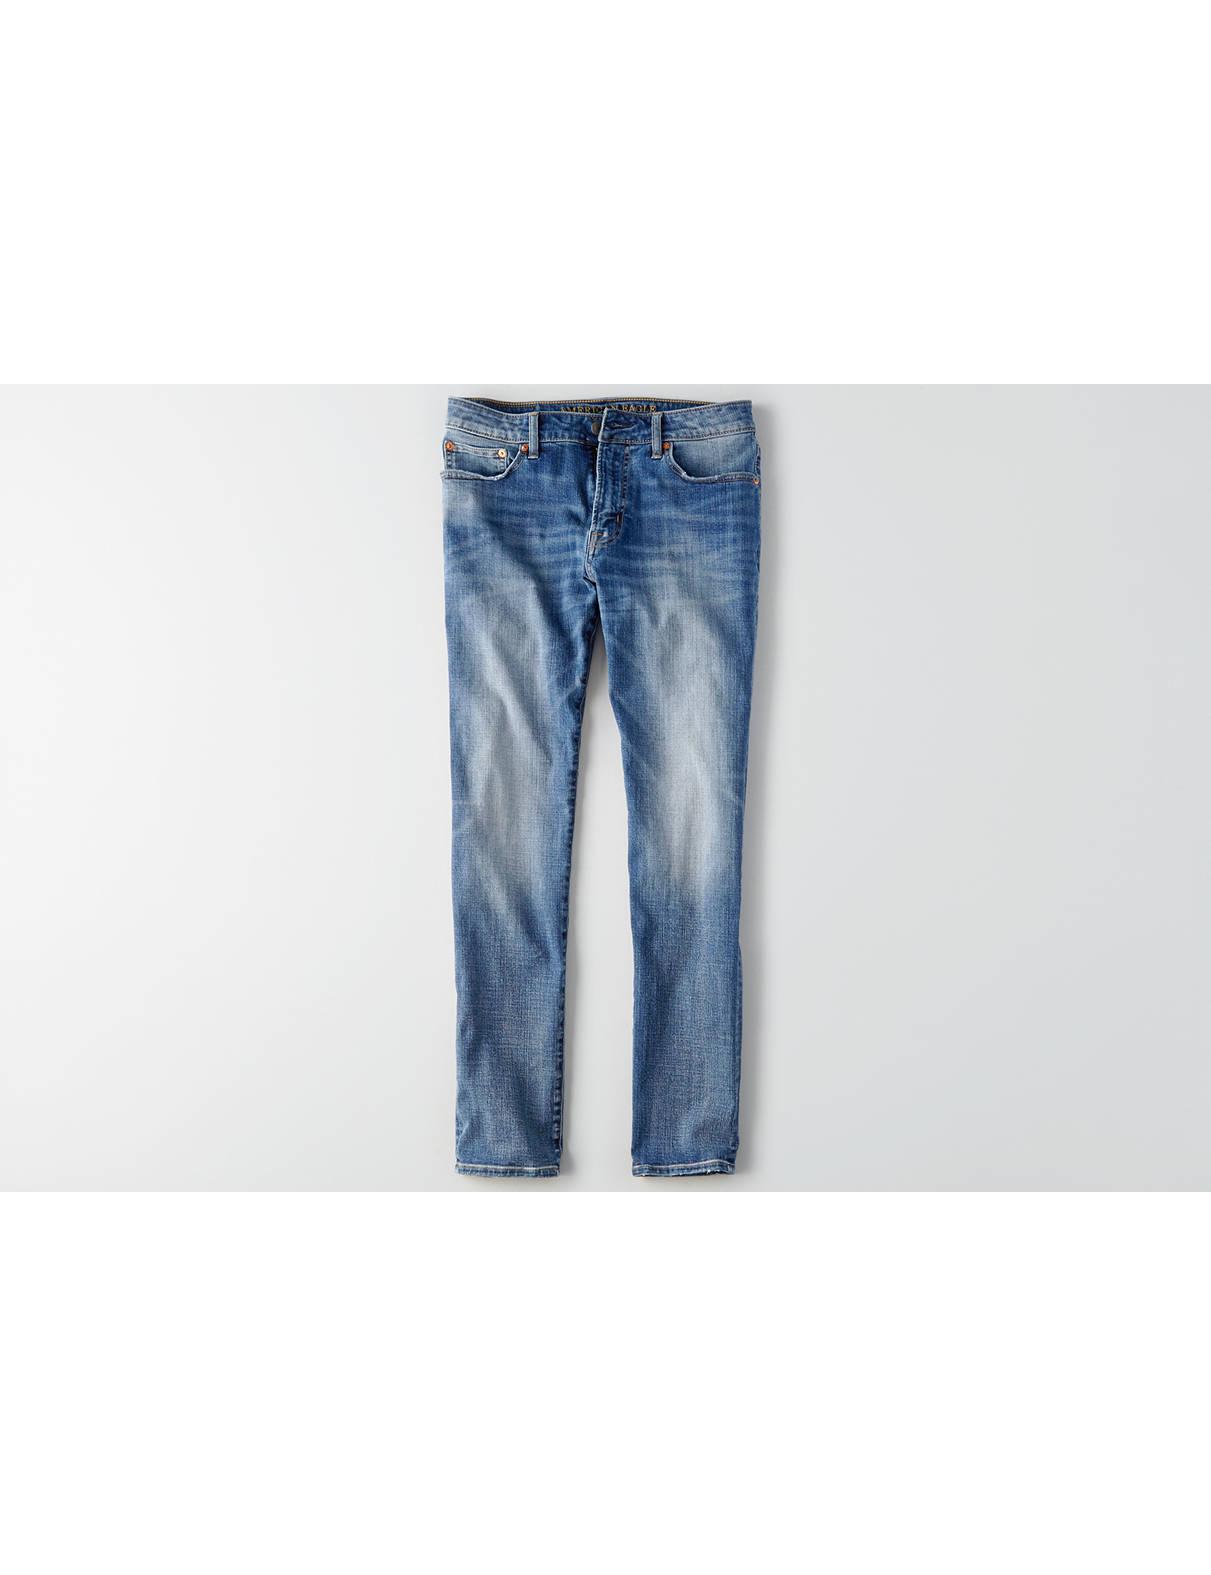 Herren jeans low rise bootcut